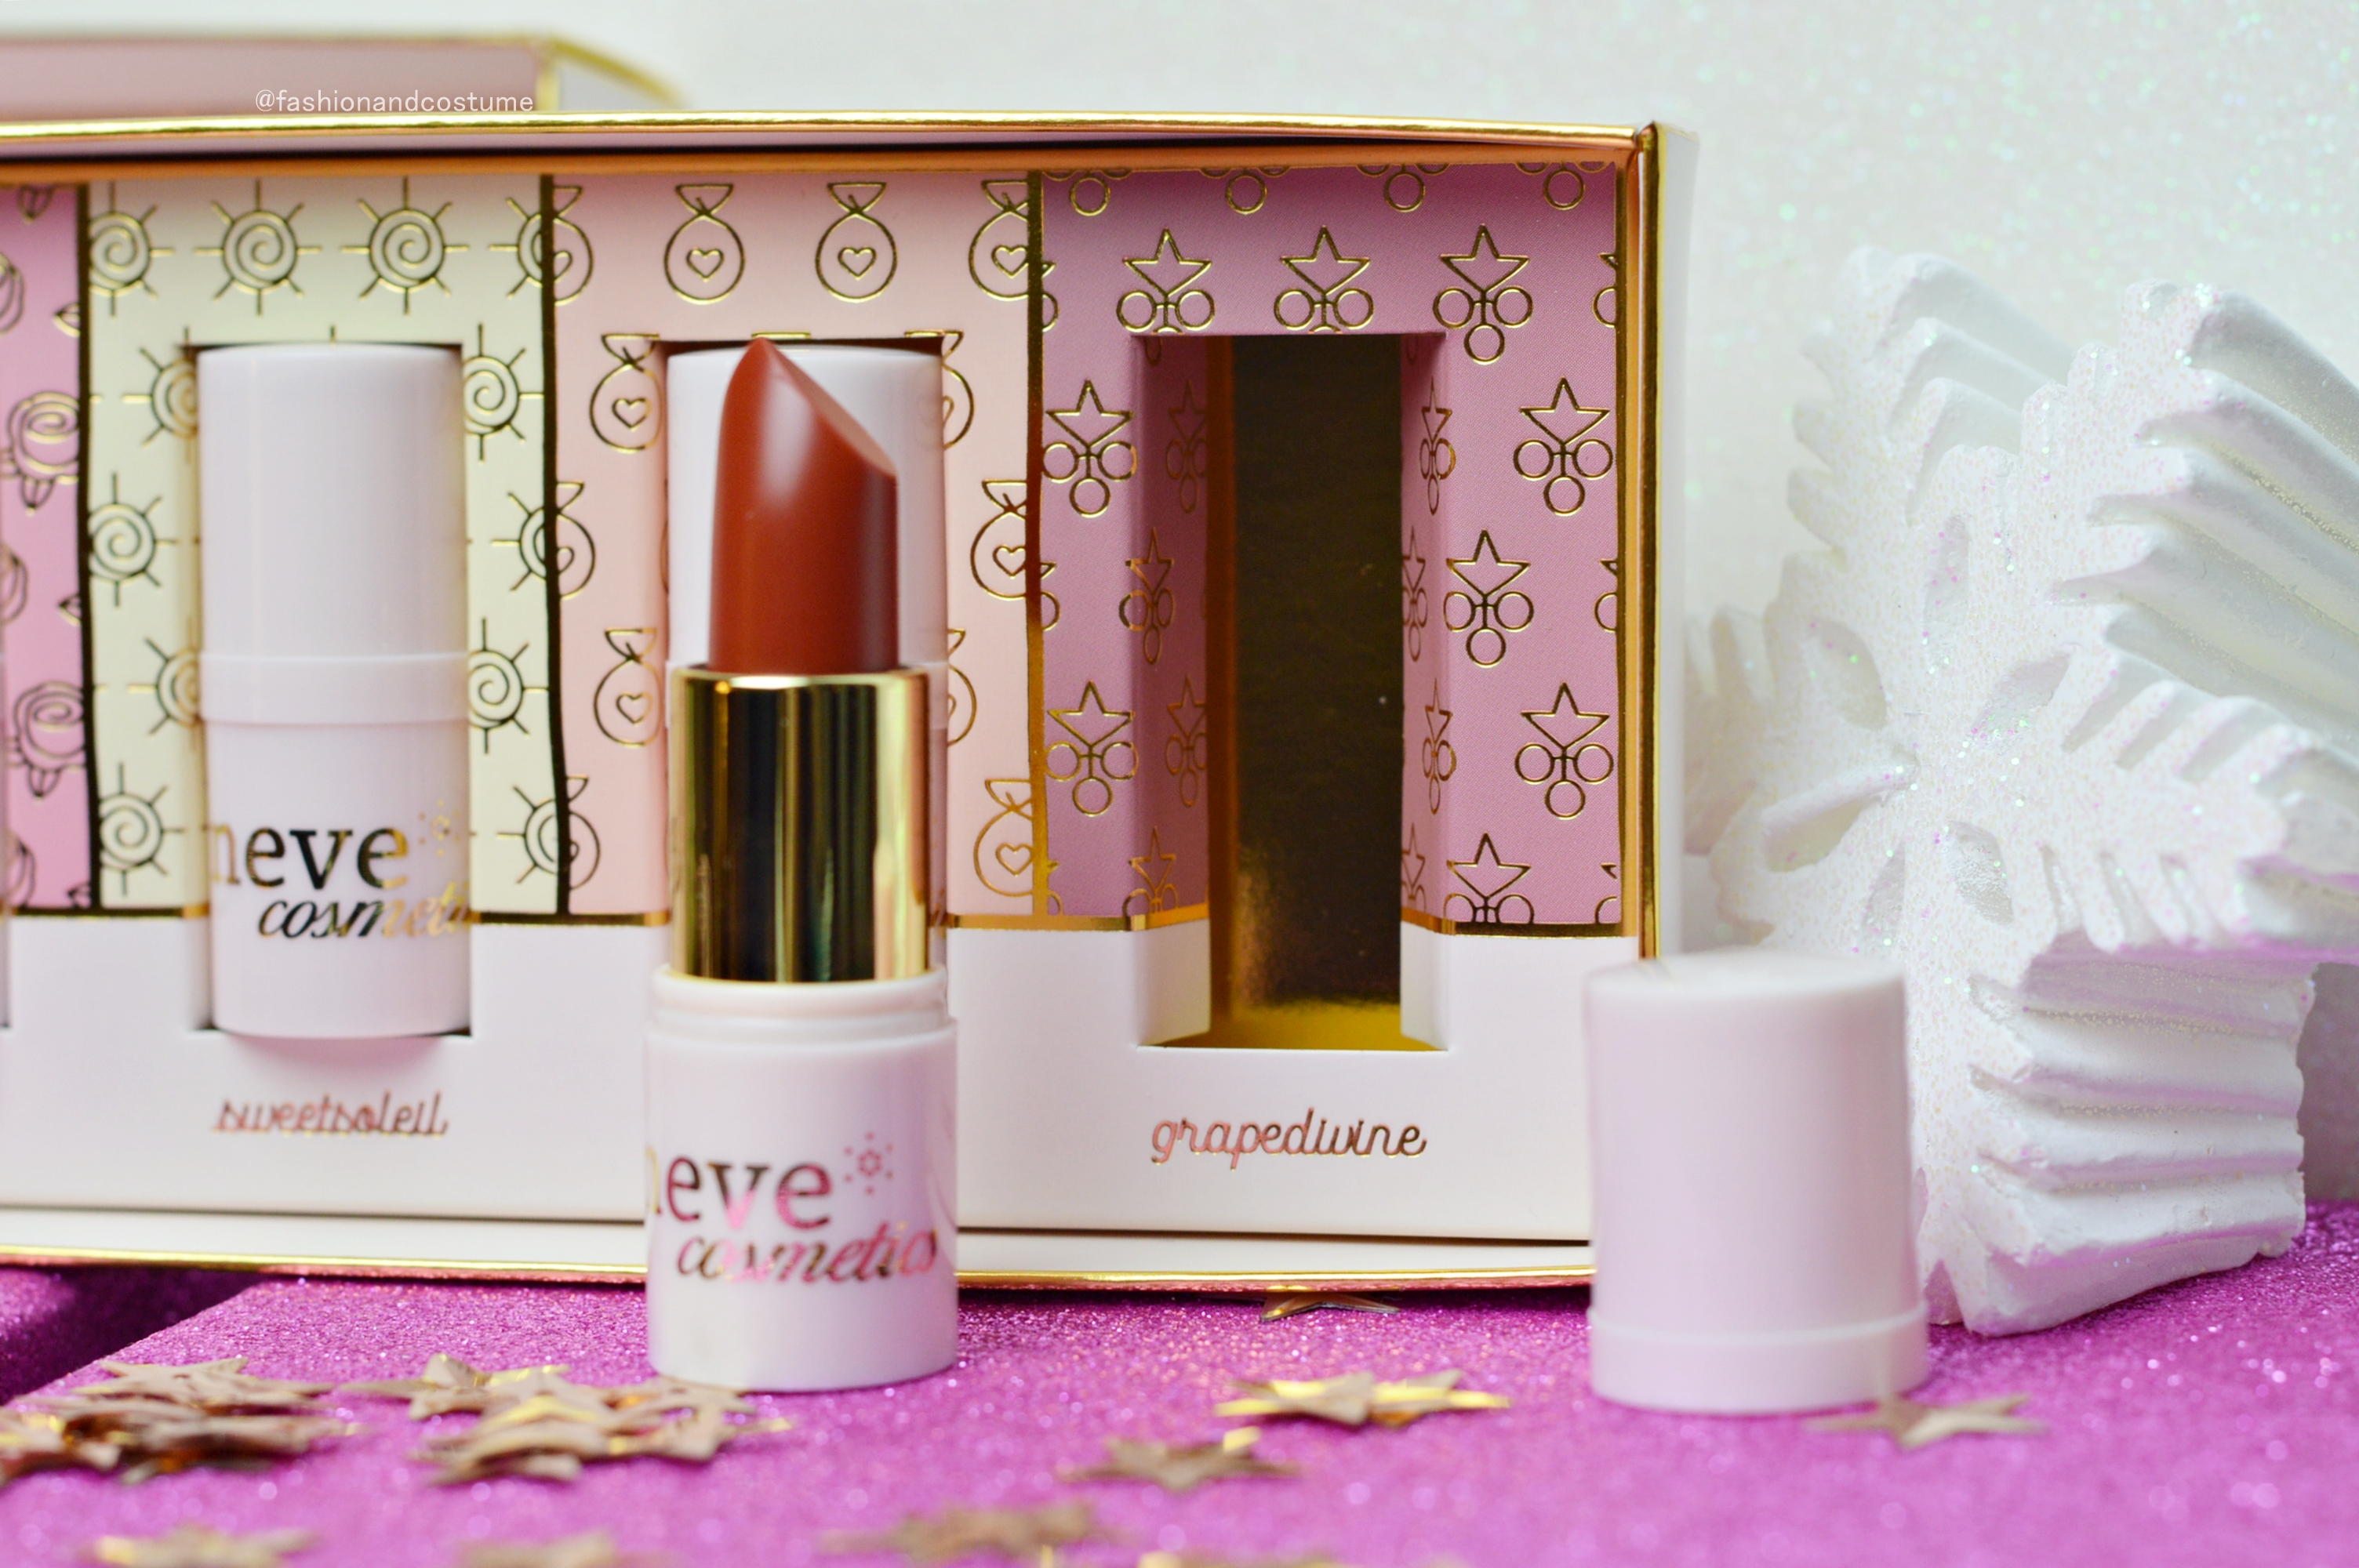 lippini-lipbalm-neve-cosmetics-naturale-labbra-idratate-idratare-roseosée-sweetsoleil-natale-promozione-grapedivine-candysoft-blog